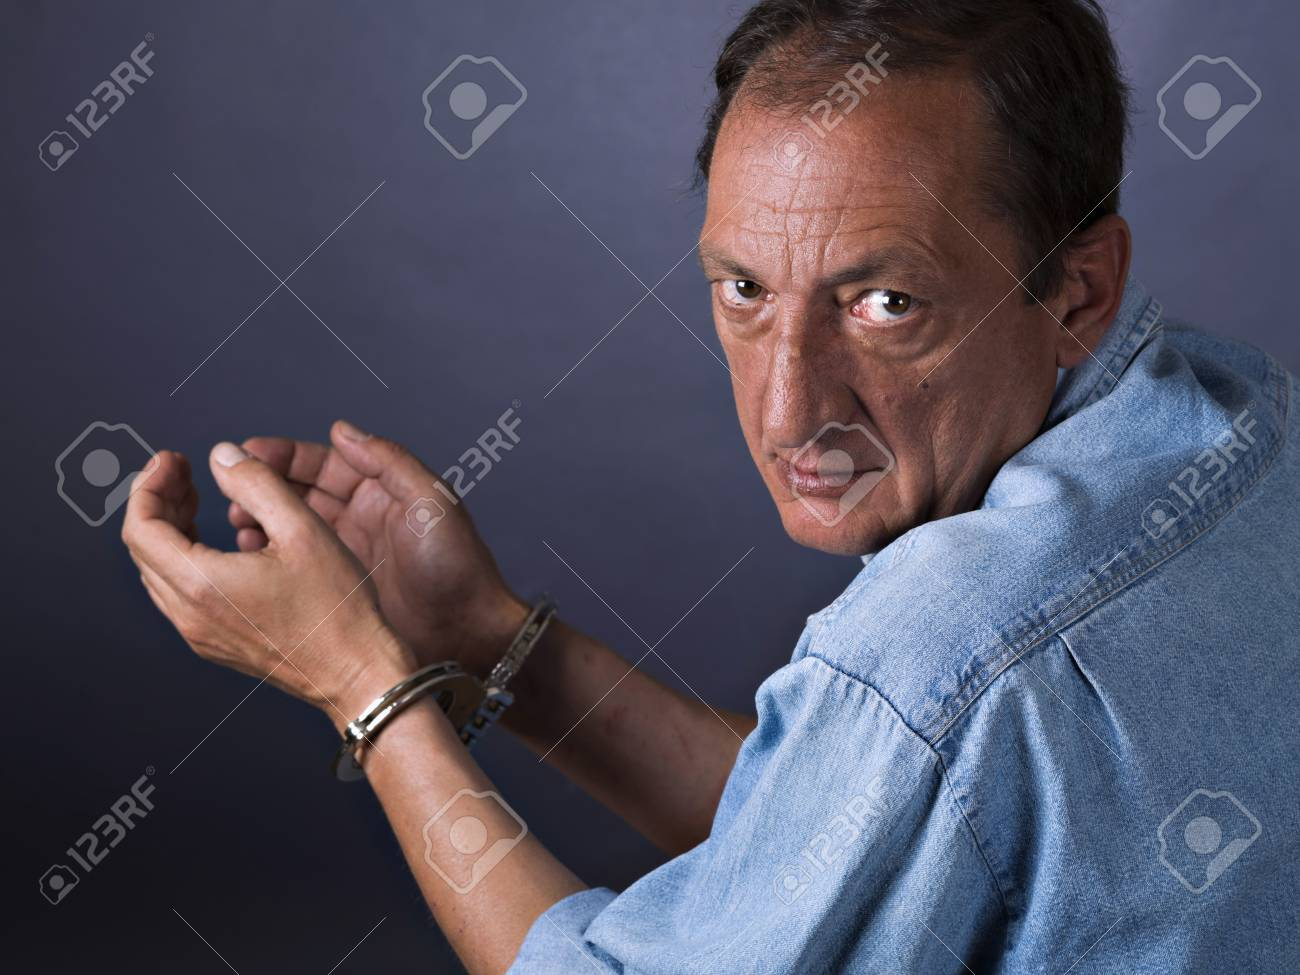 Man, mature, with handcuffs - 38161571